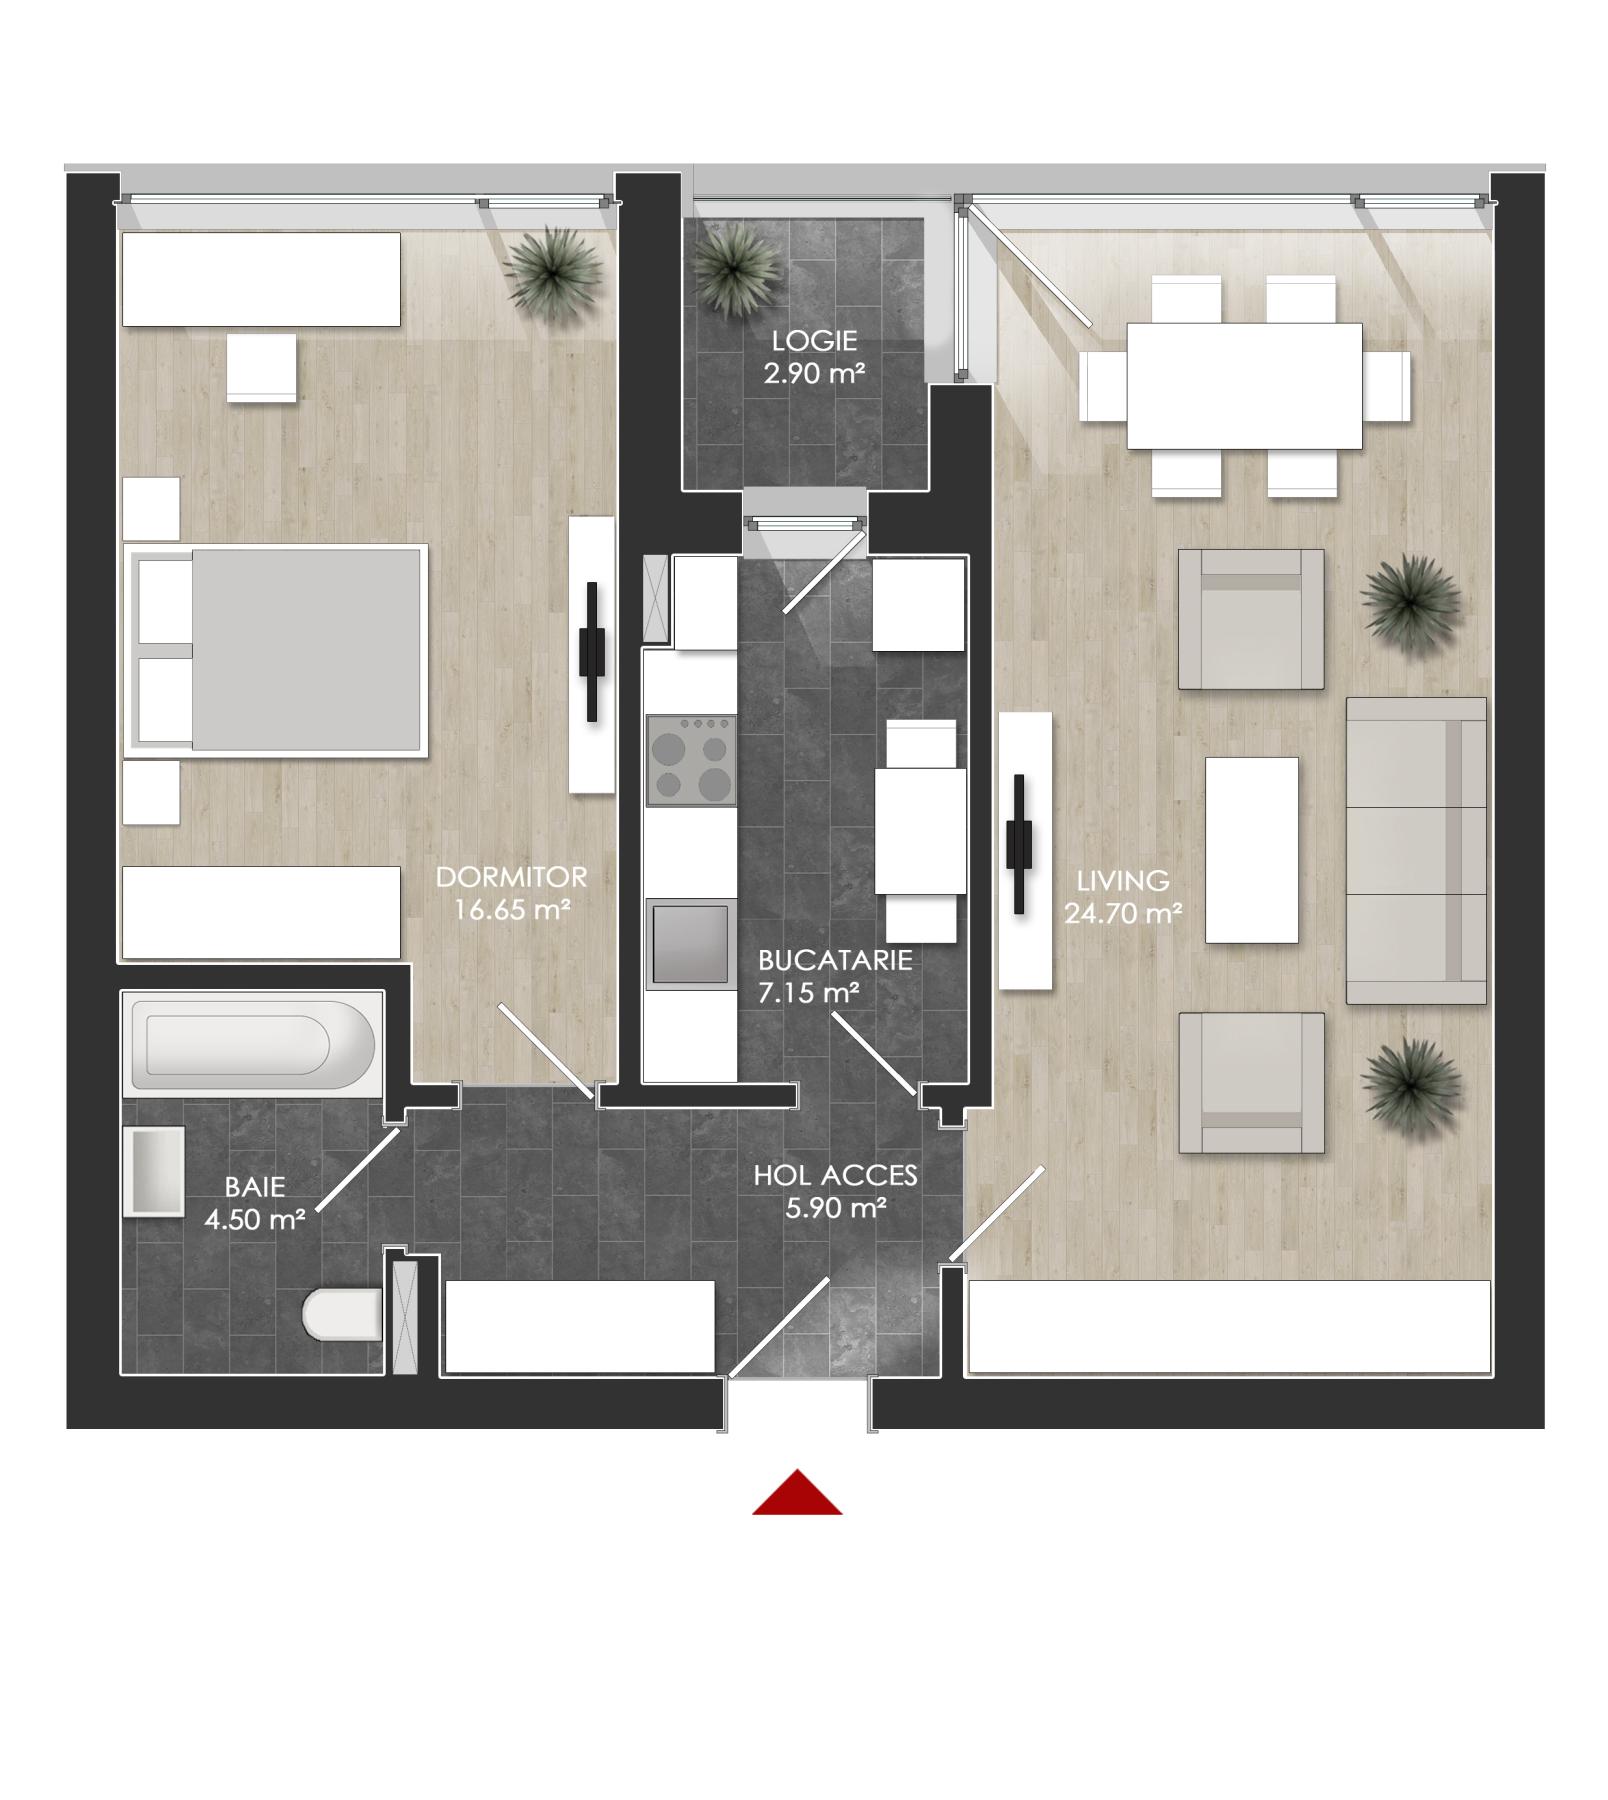 Apartament 2 camere tip 2A.2 logie | etaj 1-3 | Cladire 1A